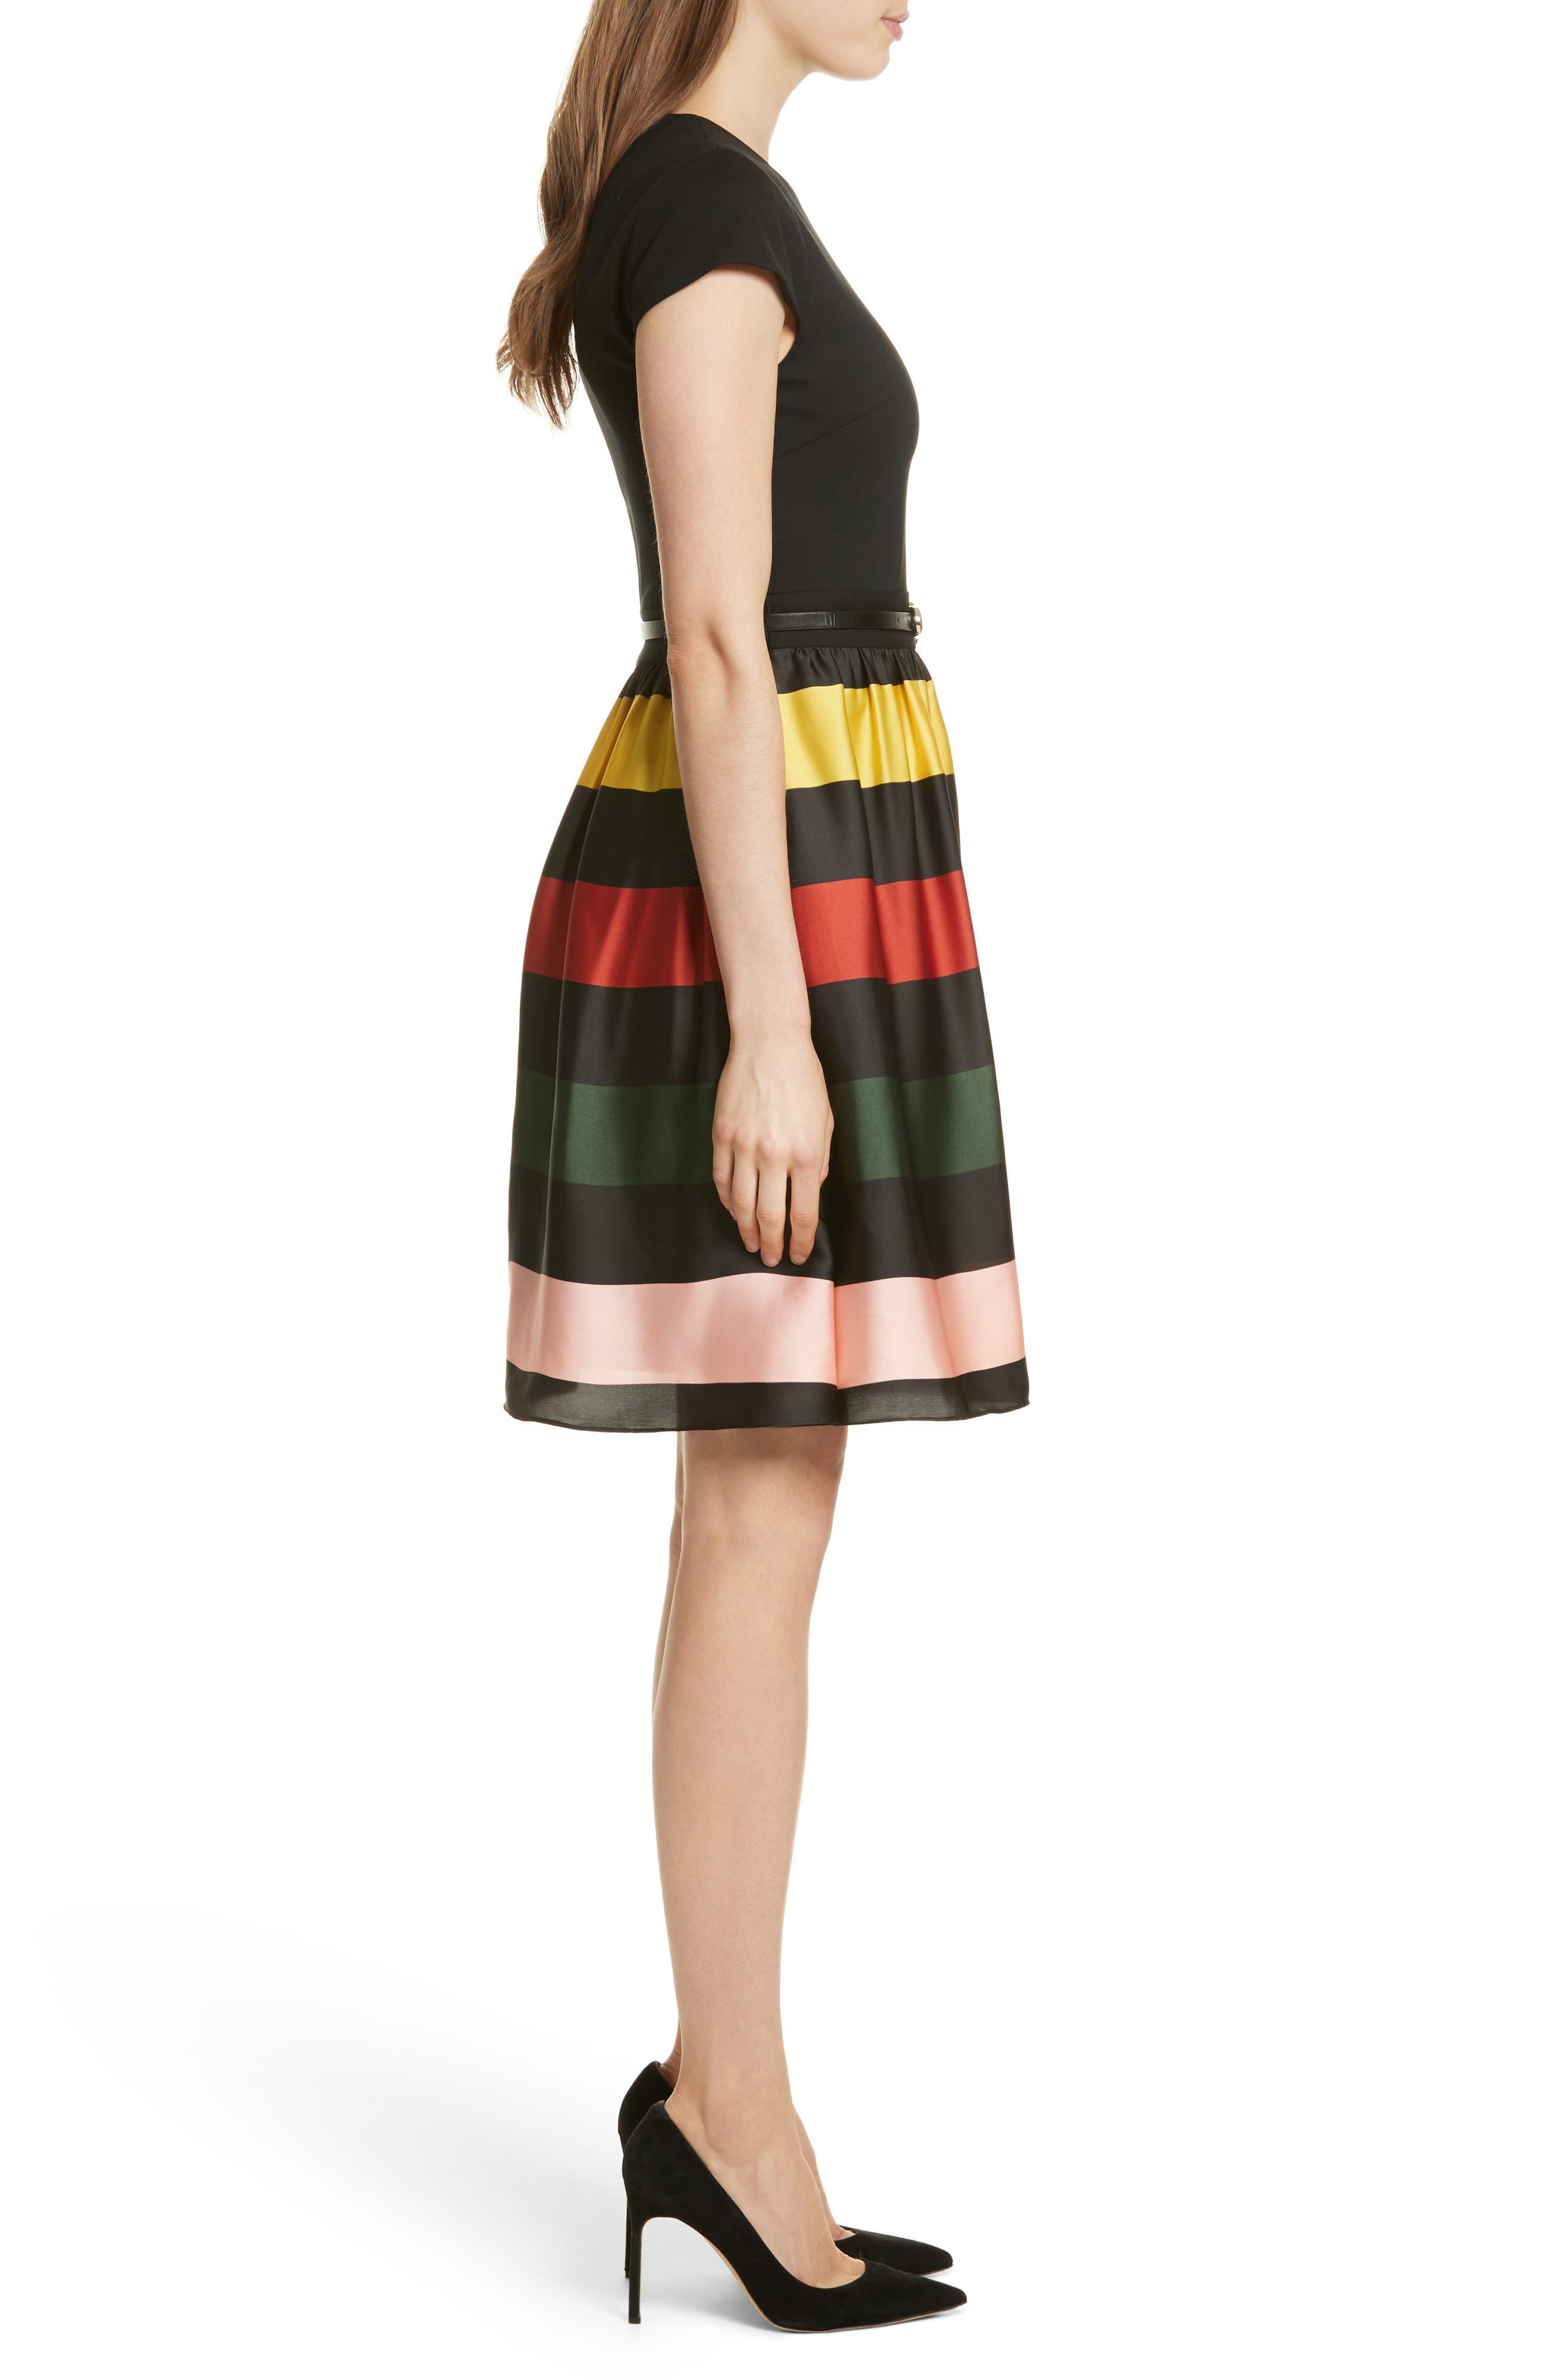 TED BAKER LONDON,                             Cruise Stripe Fit & Flare Dress,                             Alternate thumbnail 3, color,                             001